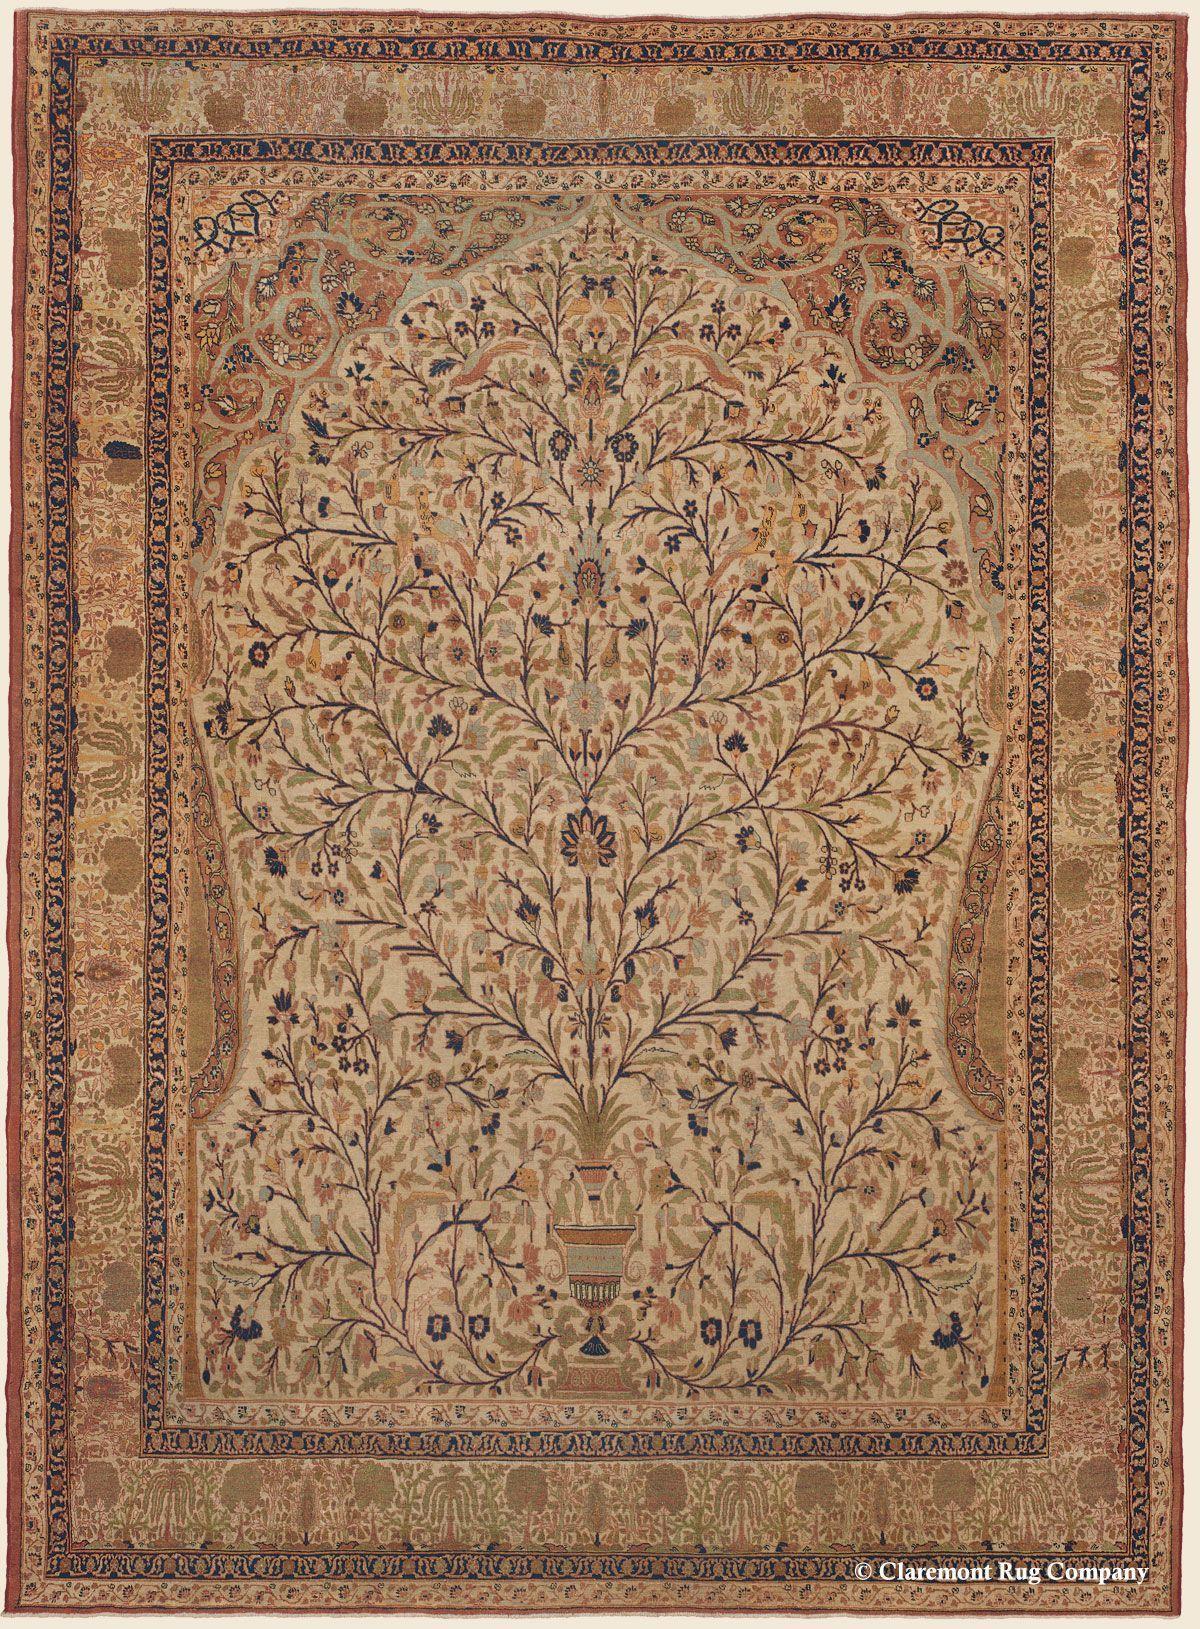 Hadji Jallili Haji Jalili Tabriz Rugs Claremont Rug Company Antique Persian Carpet Rug Company Rugs